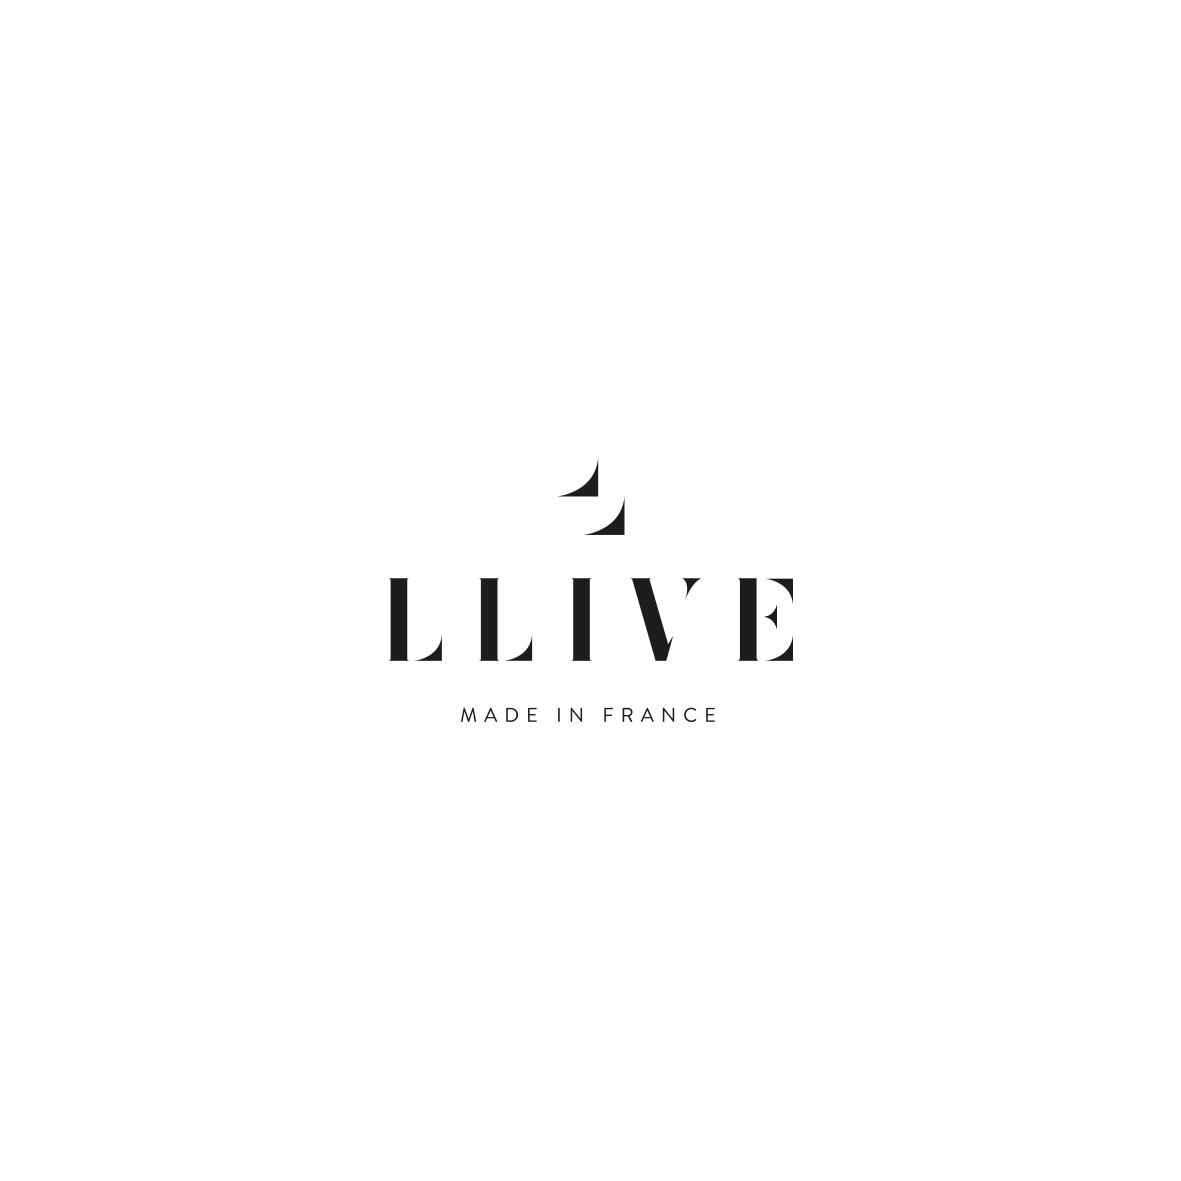 Logo_LLIVE